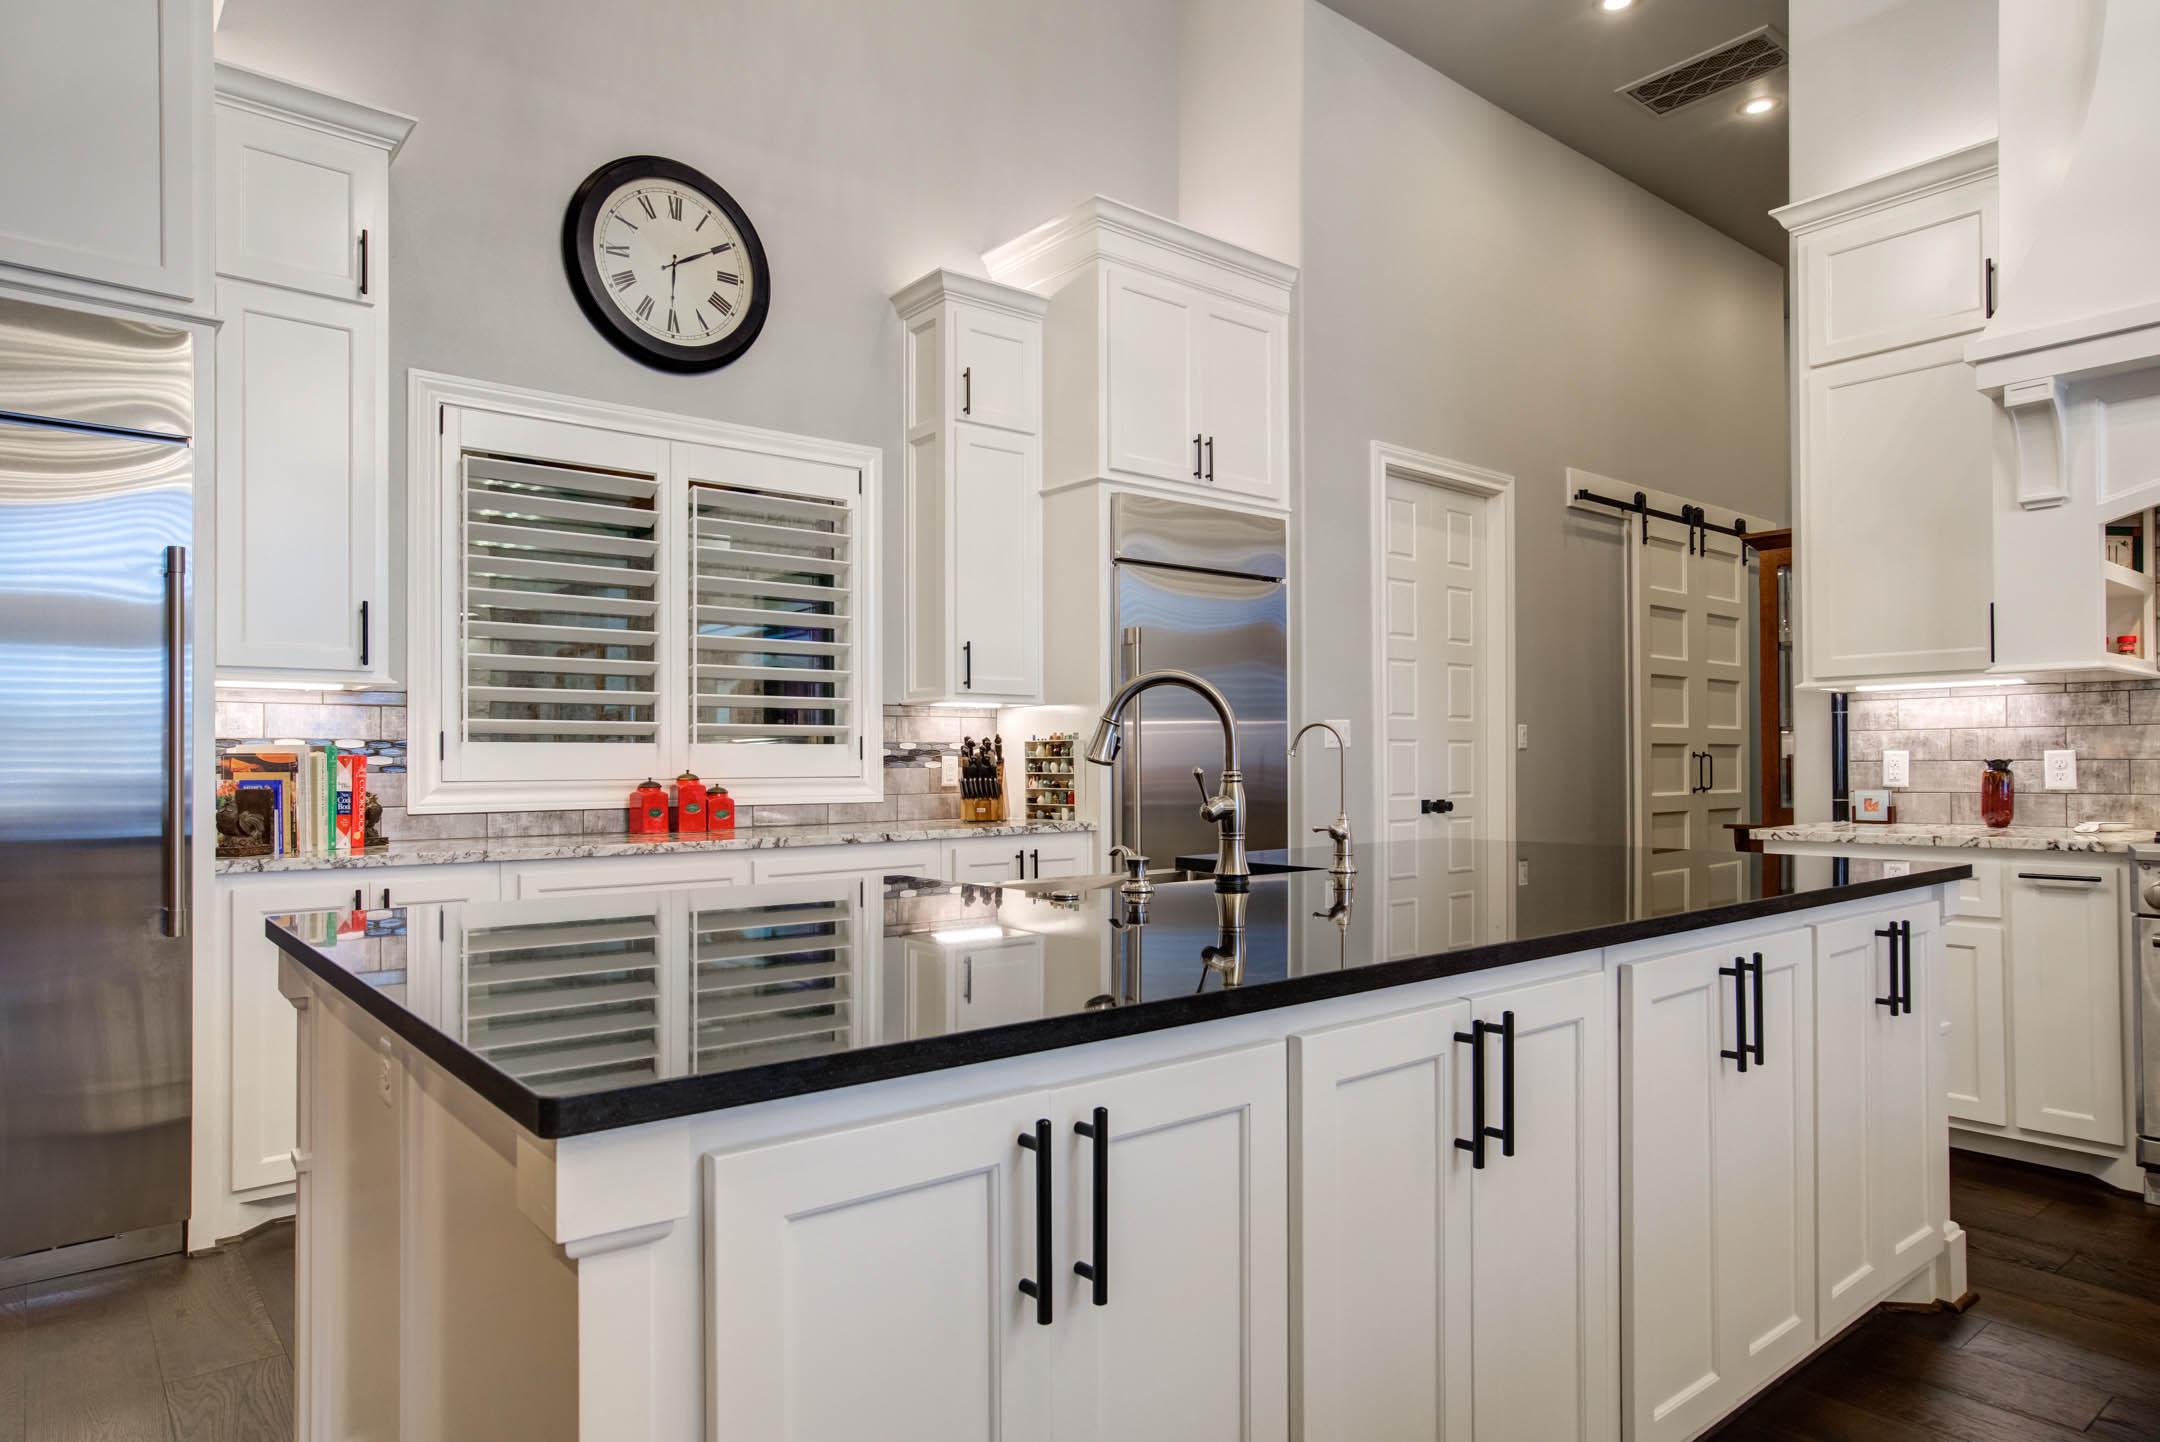 Center island in kitchen of custom home.